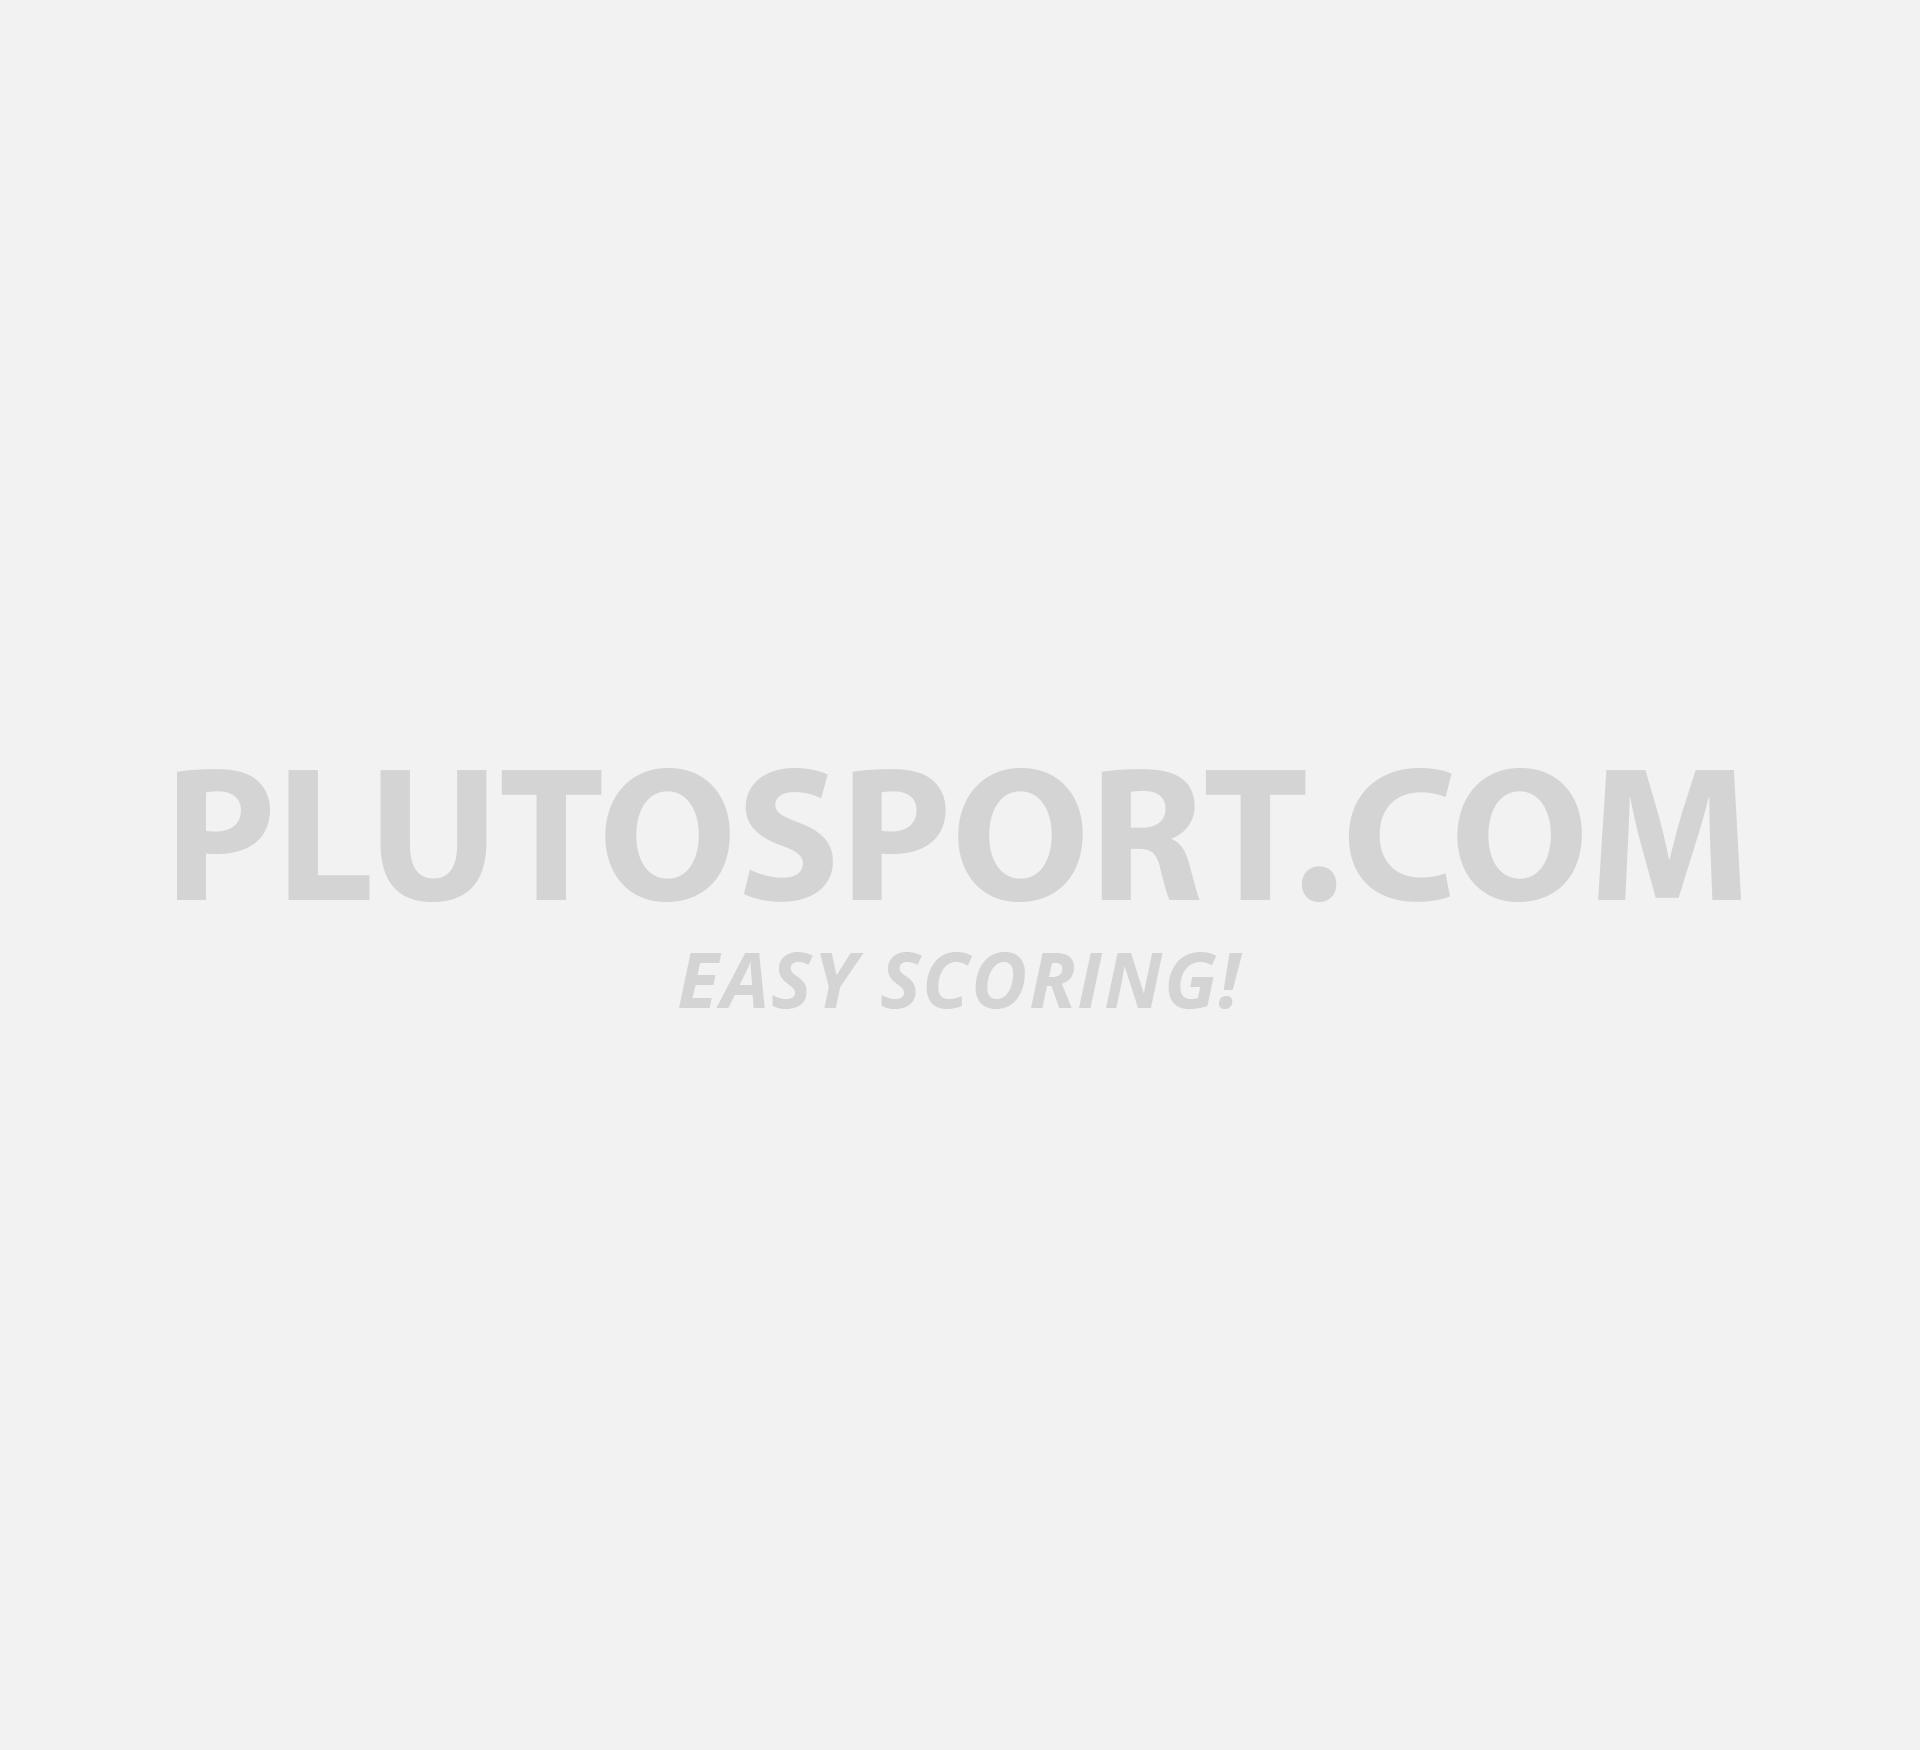 Dunlop Tour Pro Padel Replacement Grip